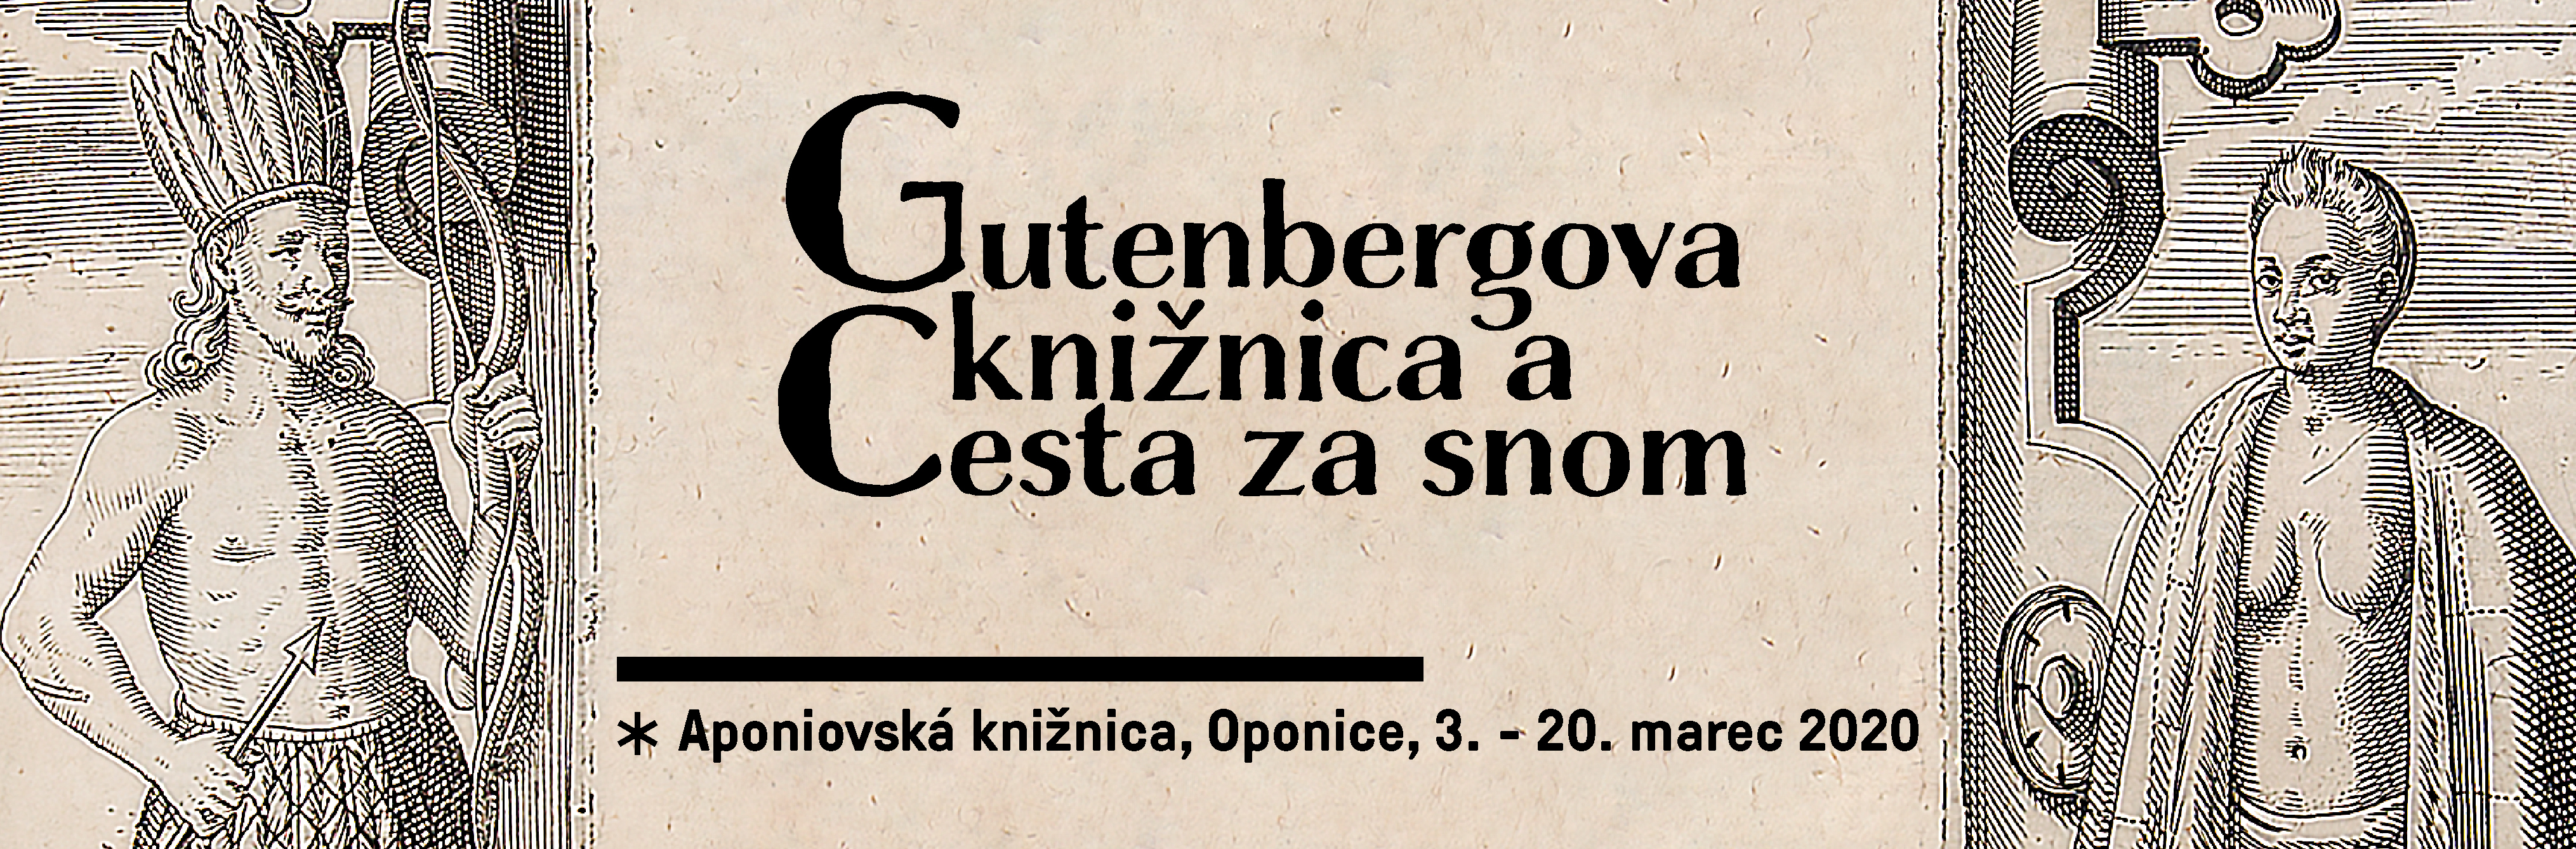 Gutenbergova knižnica a Cesta za snom